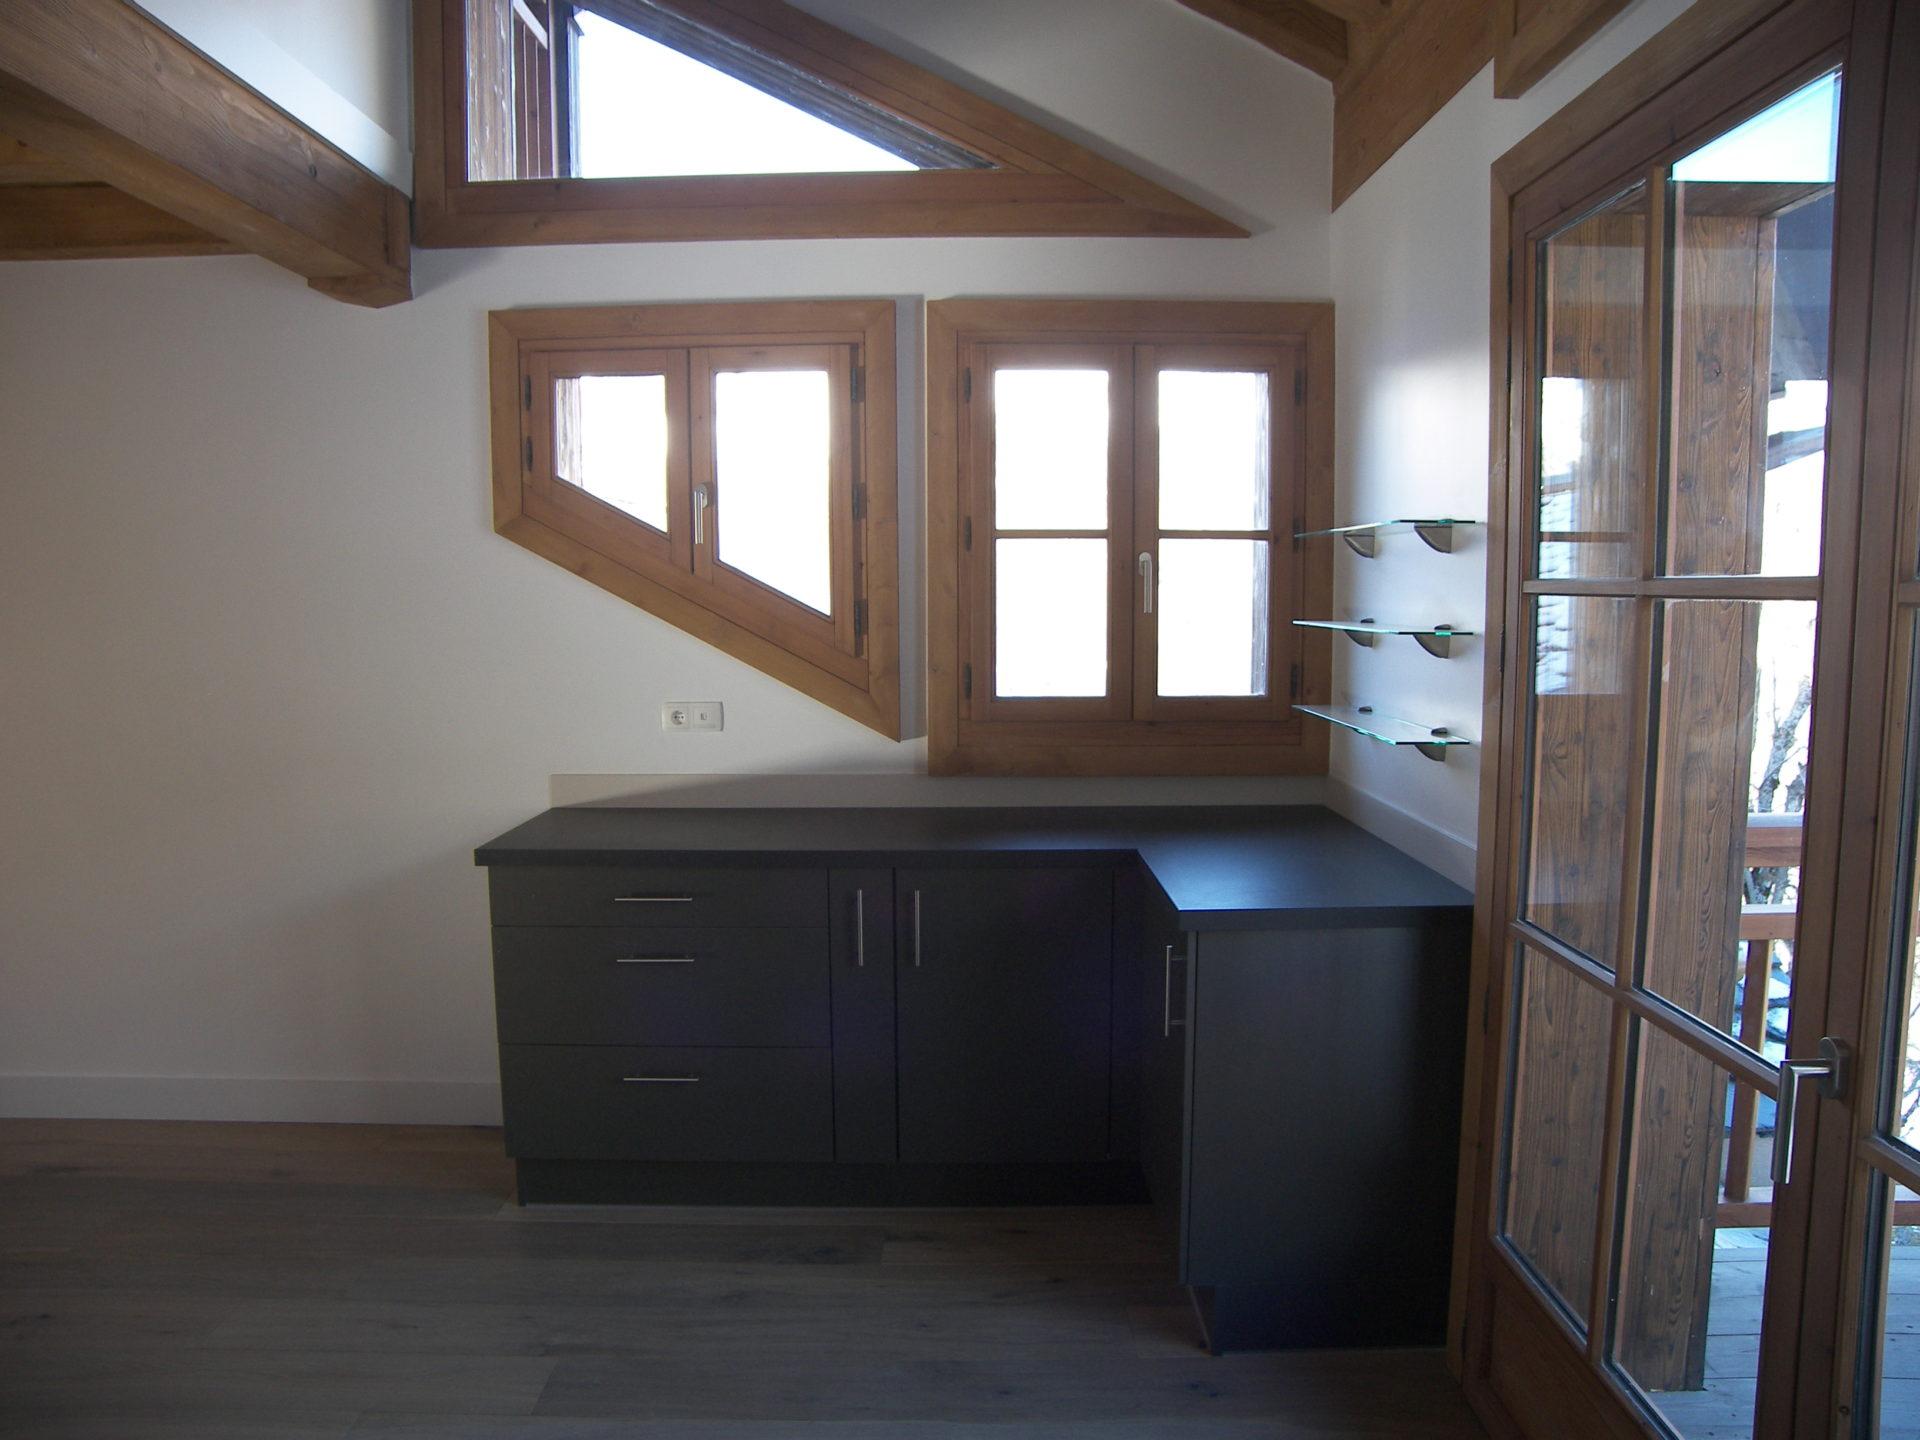 Chalets Nant Giraud II - Appartement H - Saint Martin de Belleville Savoie France